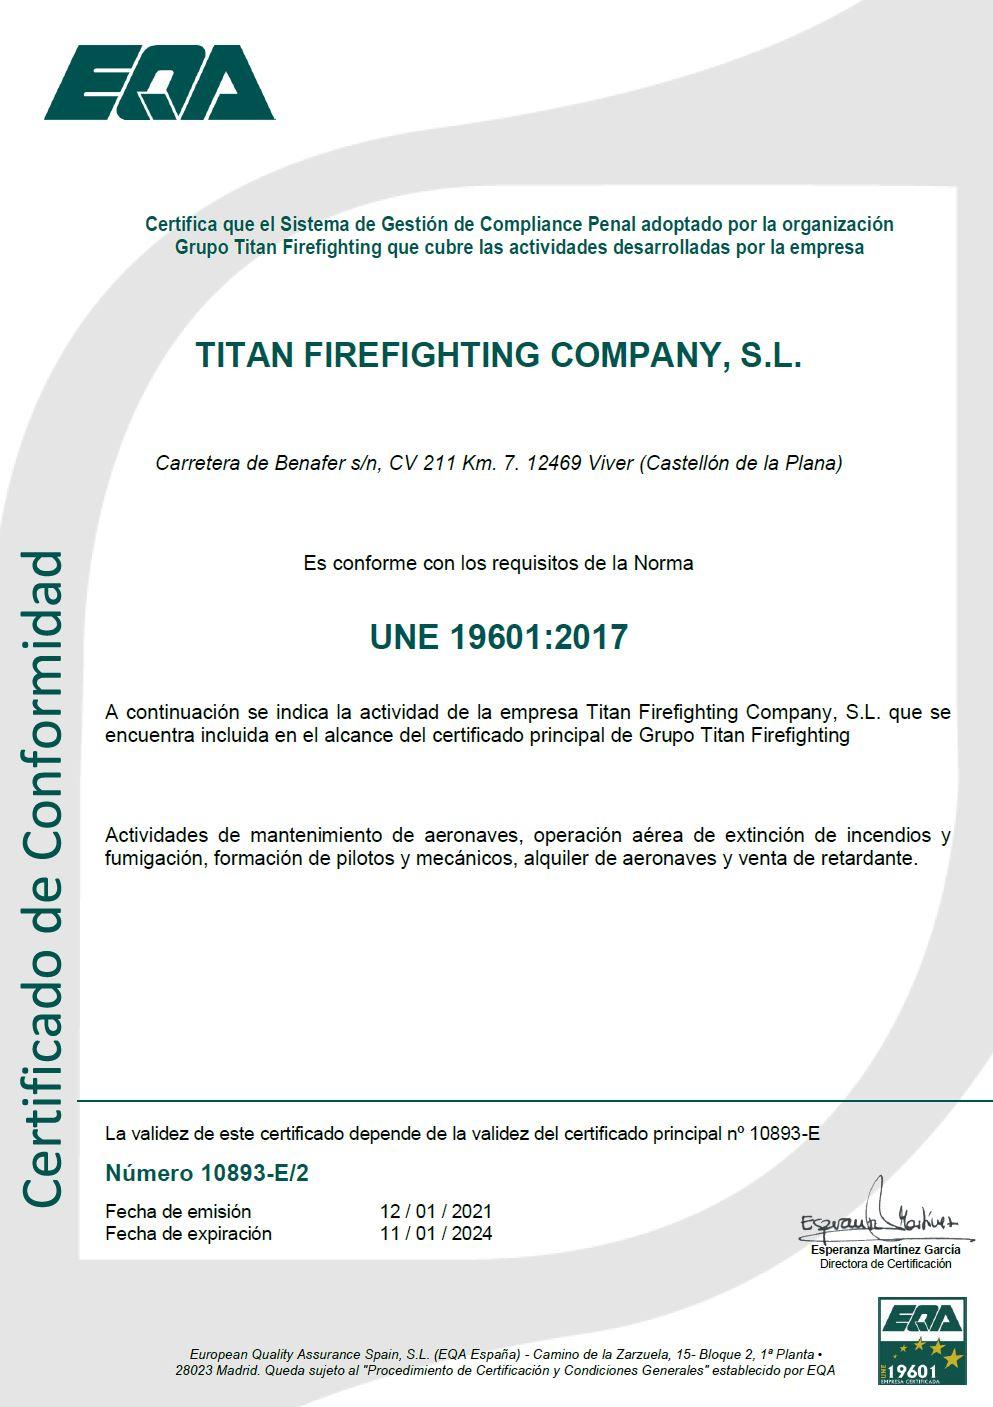 Compliance diploma